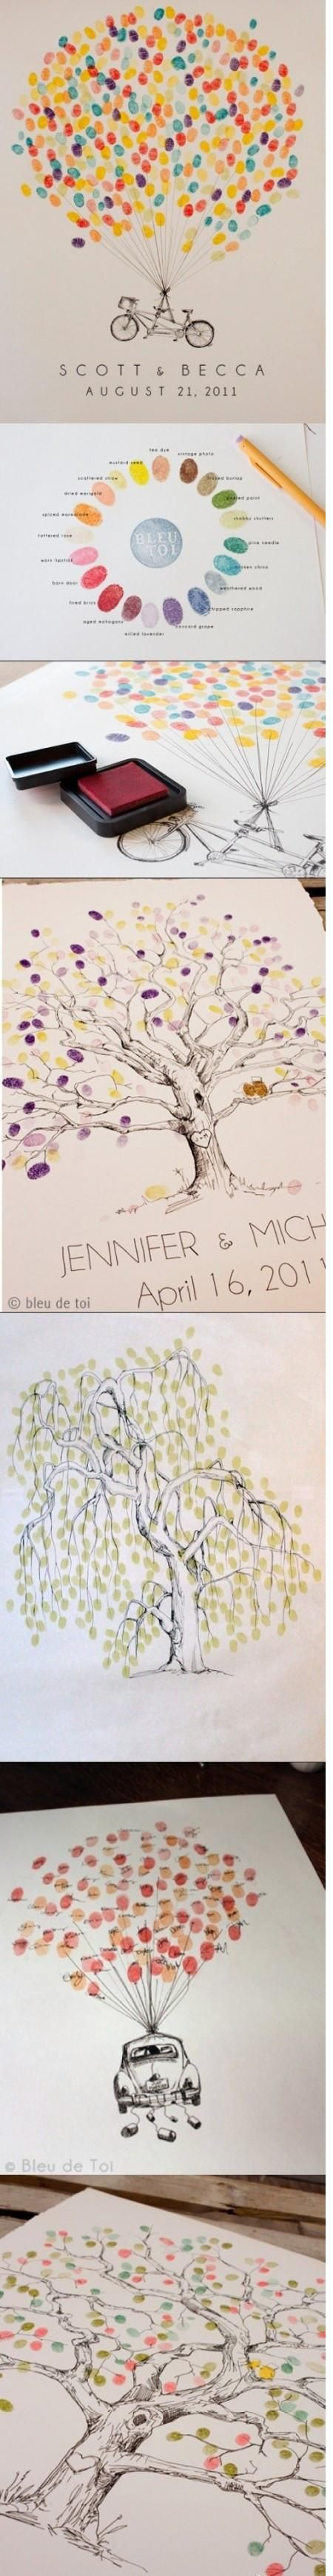 Beautiful idea. Love the wedding willow.